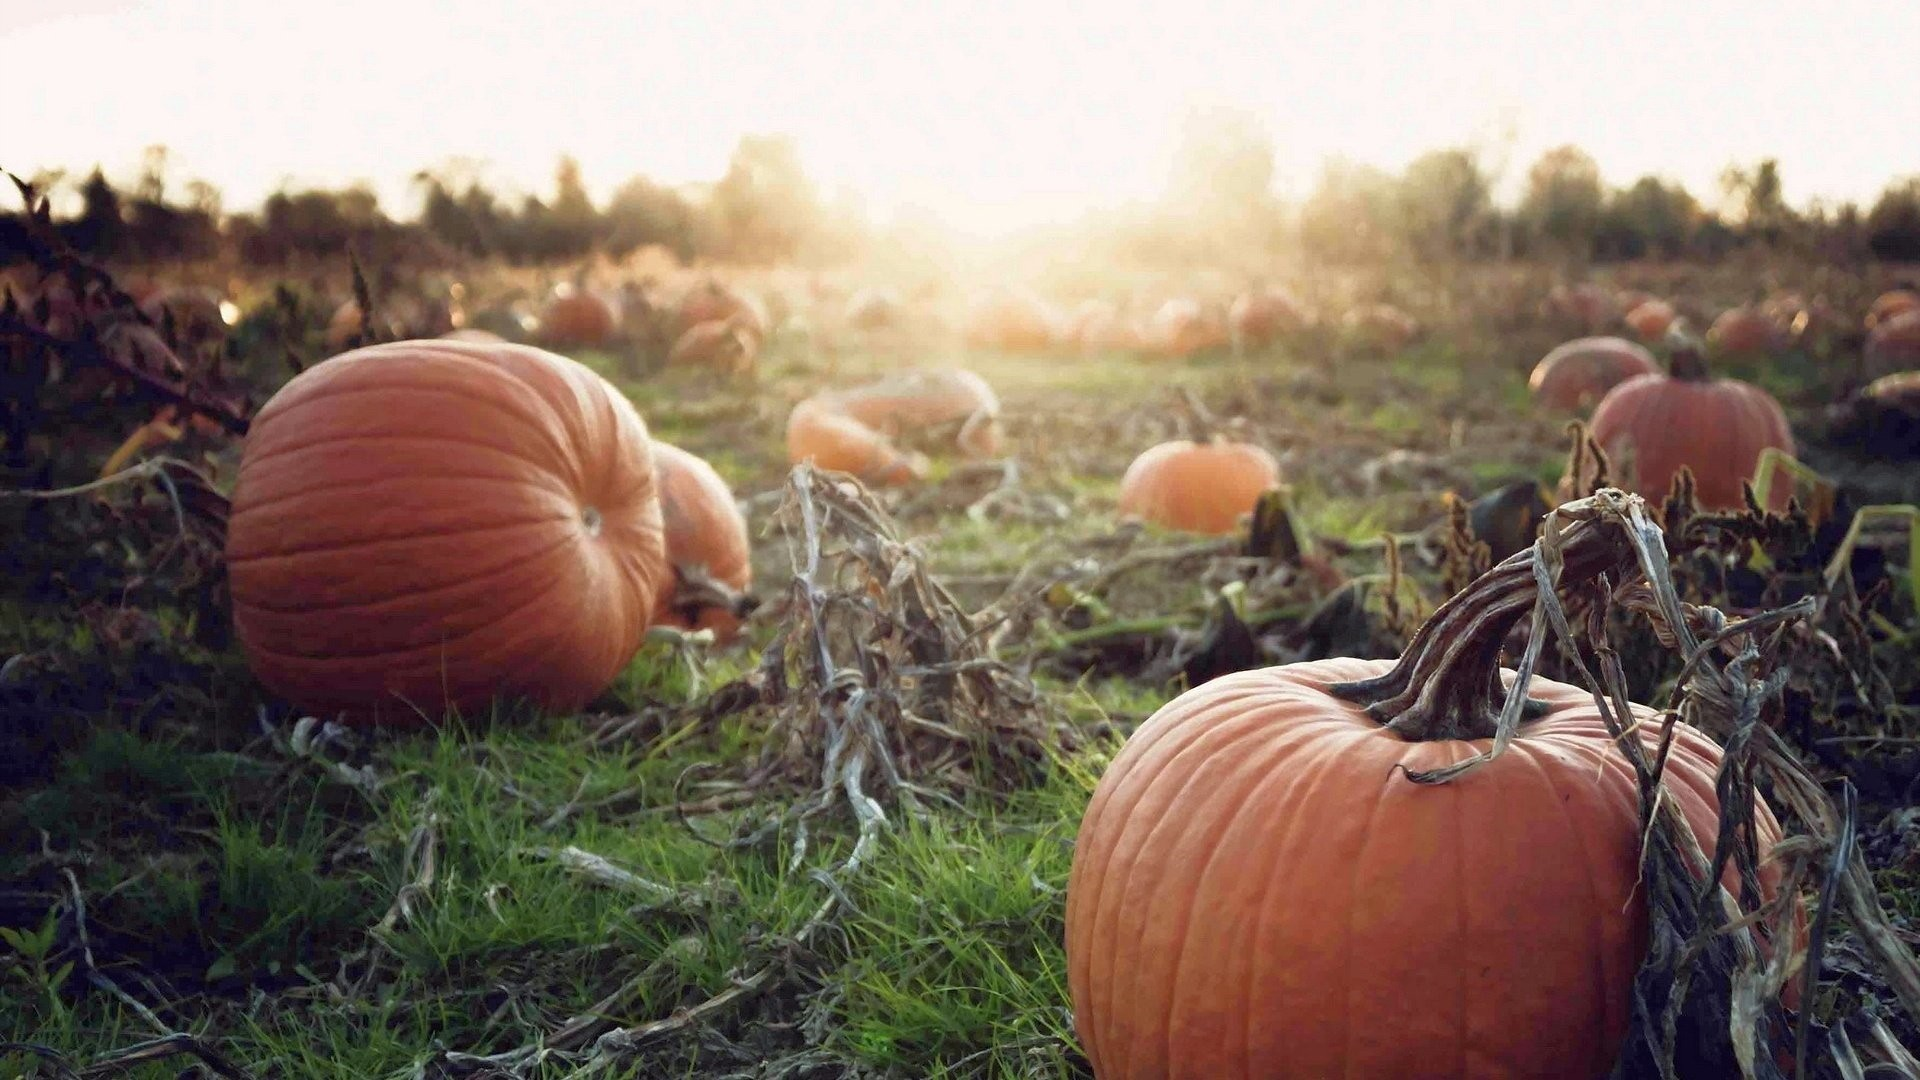 Pumpkin Full HD Wallpaper